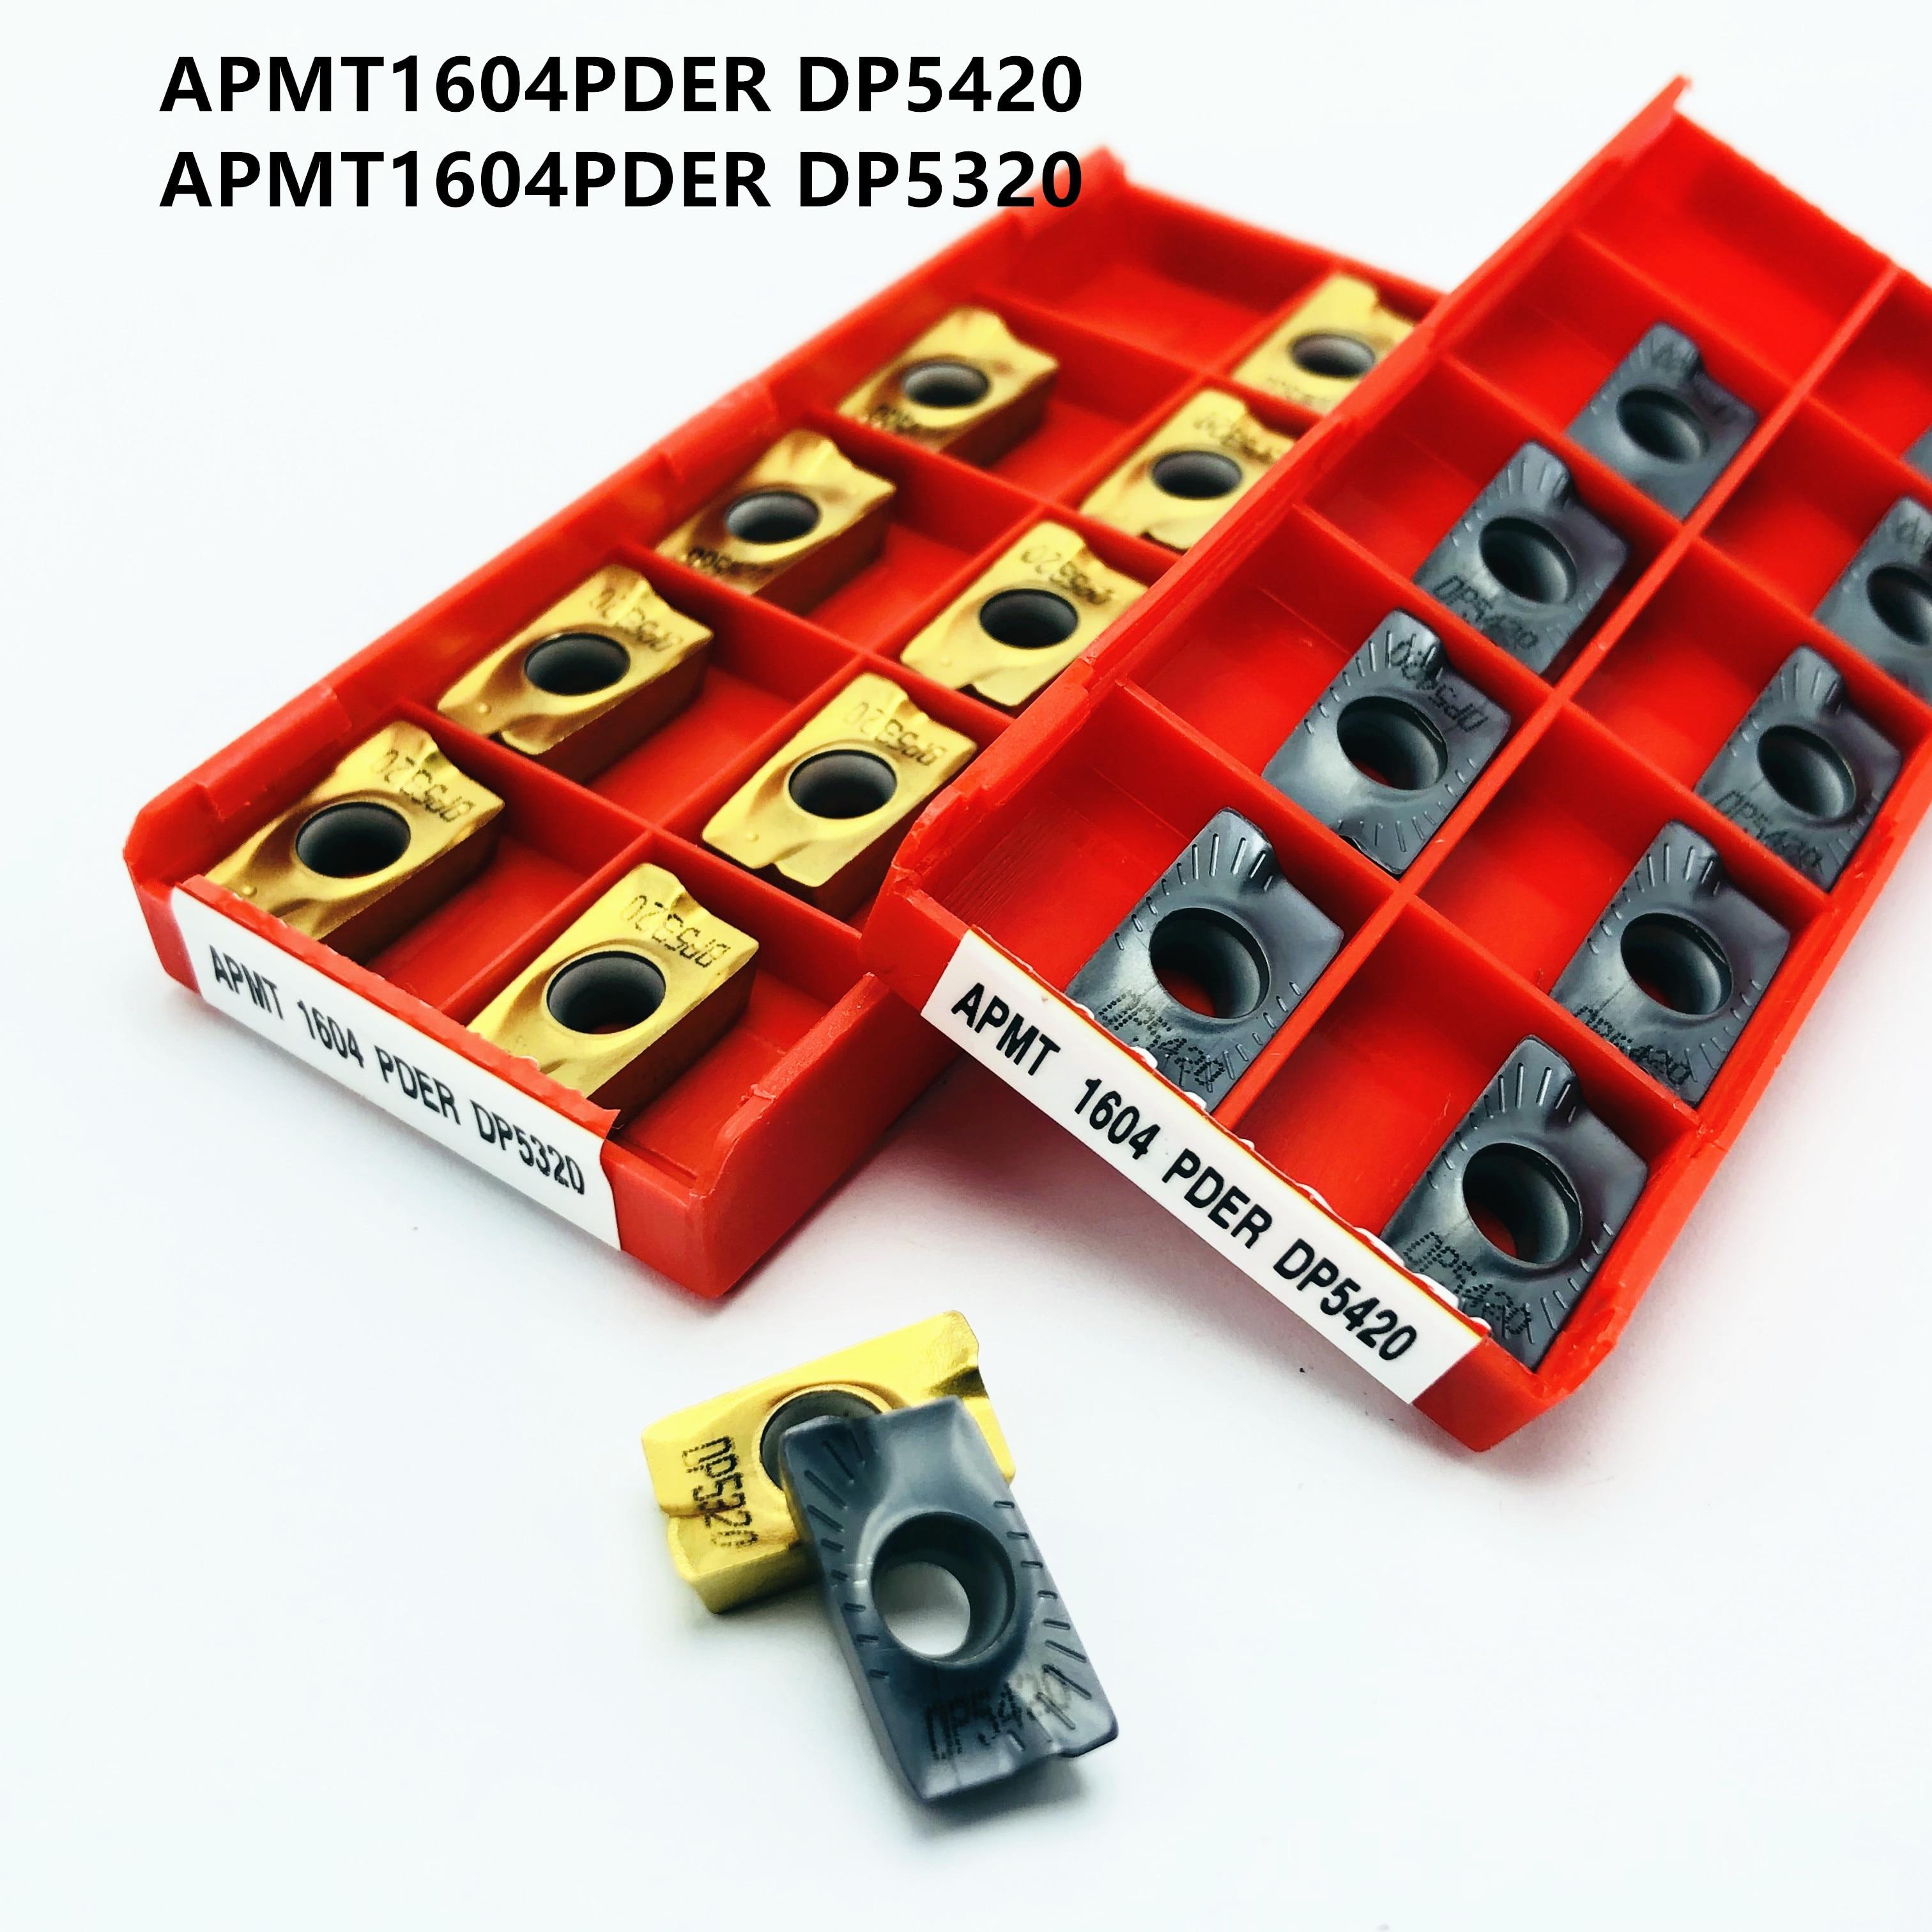 APMT1604 APMT1135 PDER DP5420 DP5320 Carbide Insert CNC Lathe Tool APMT1604 APMT1135 Machine Tool Accessories Milling Blade